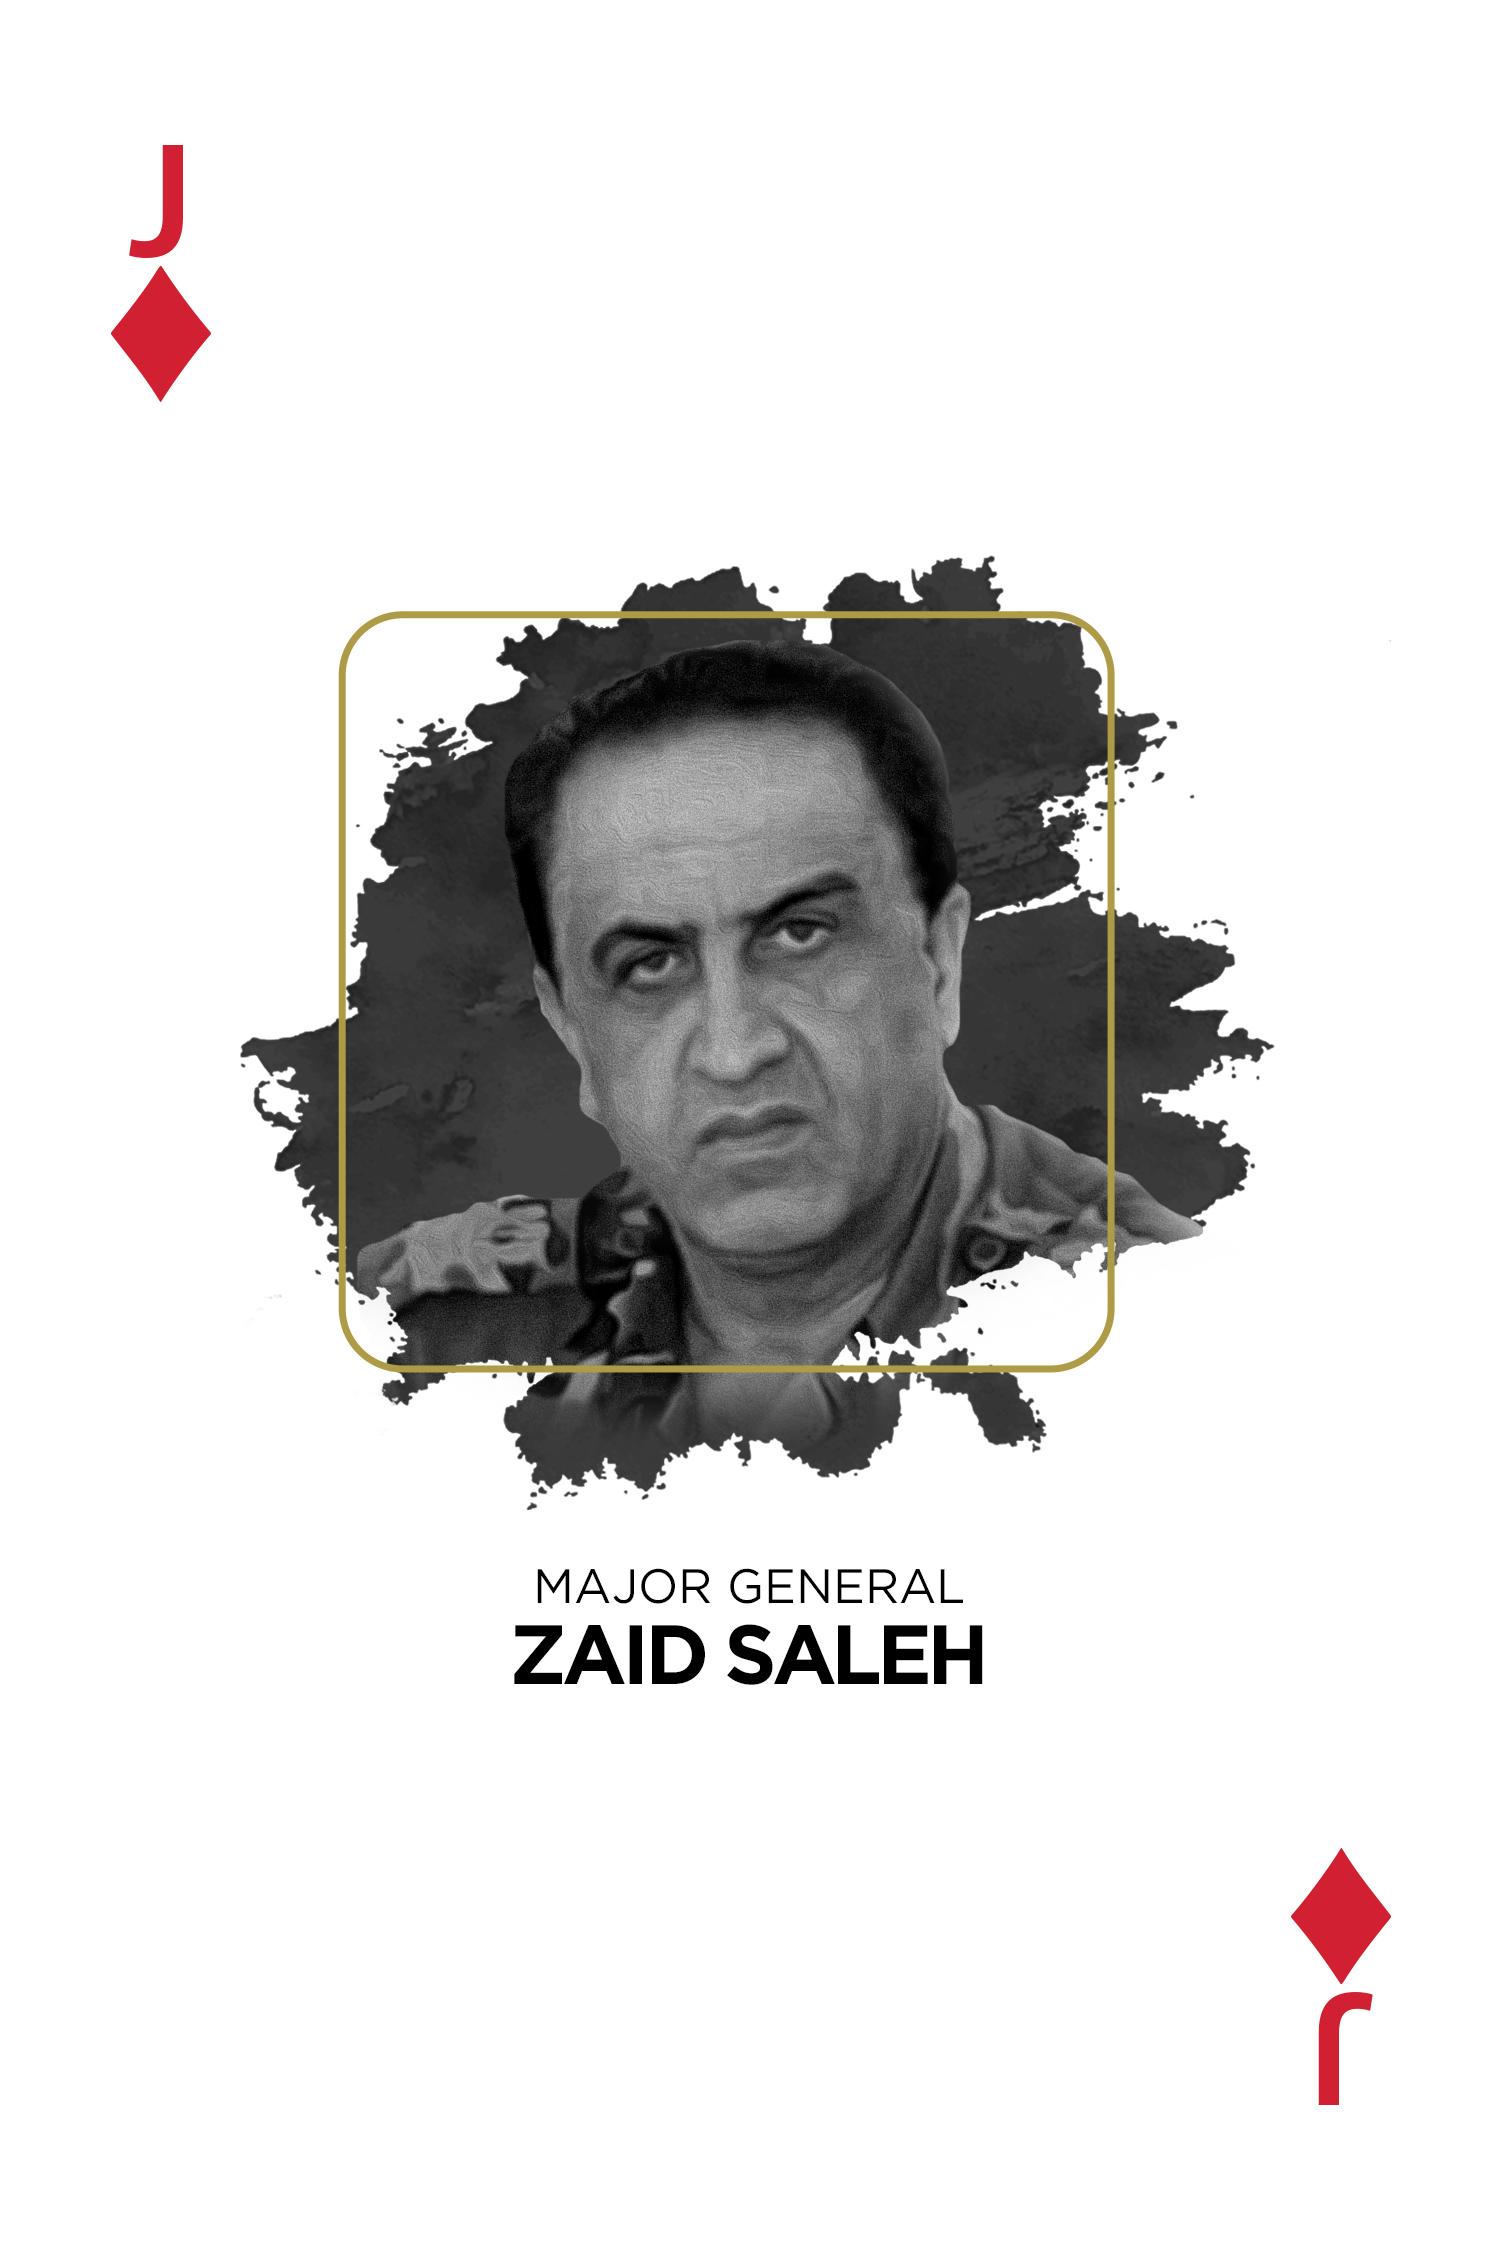 Pro Justice - Zaid Salah